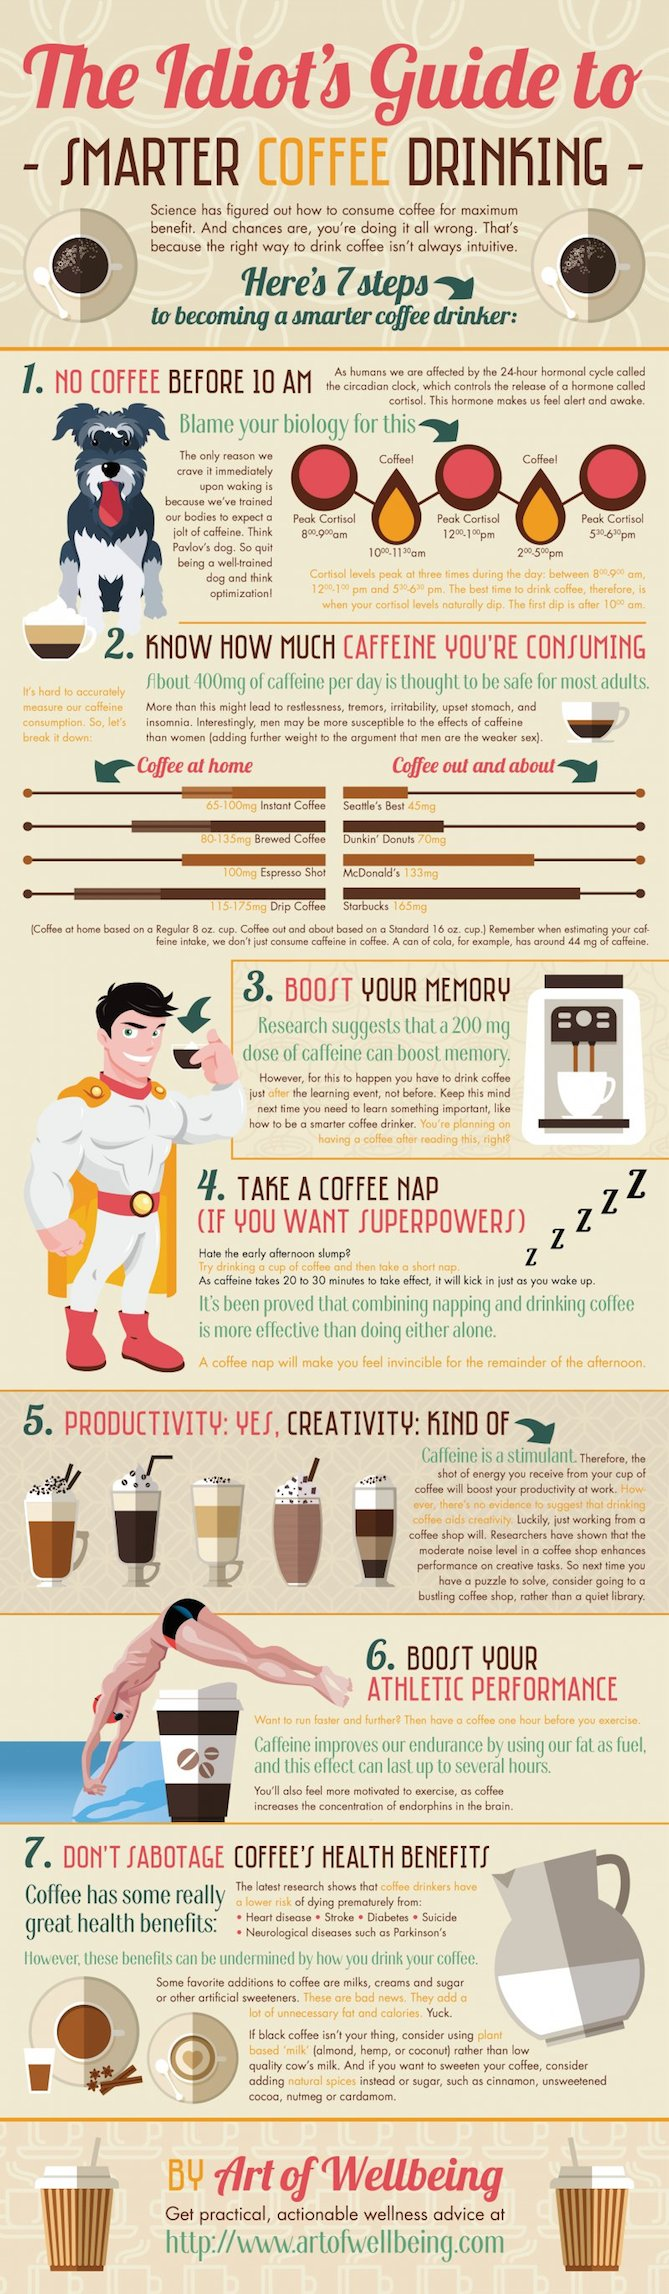 drinking-coffee-guide.jpg